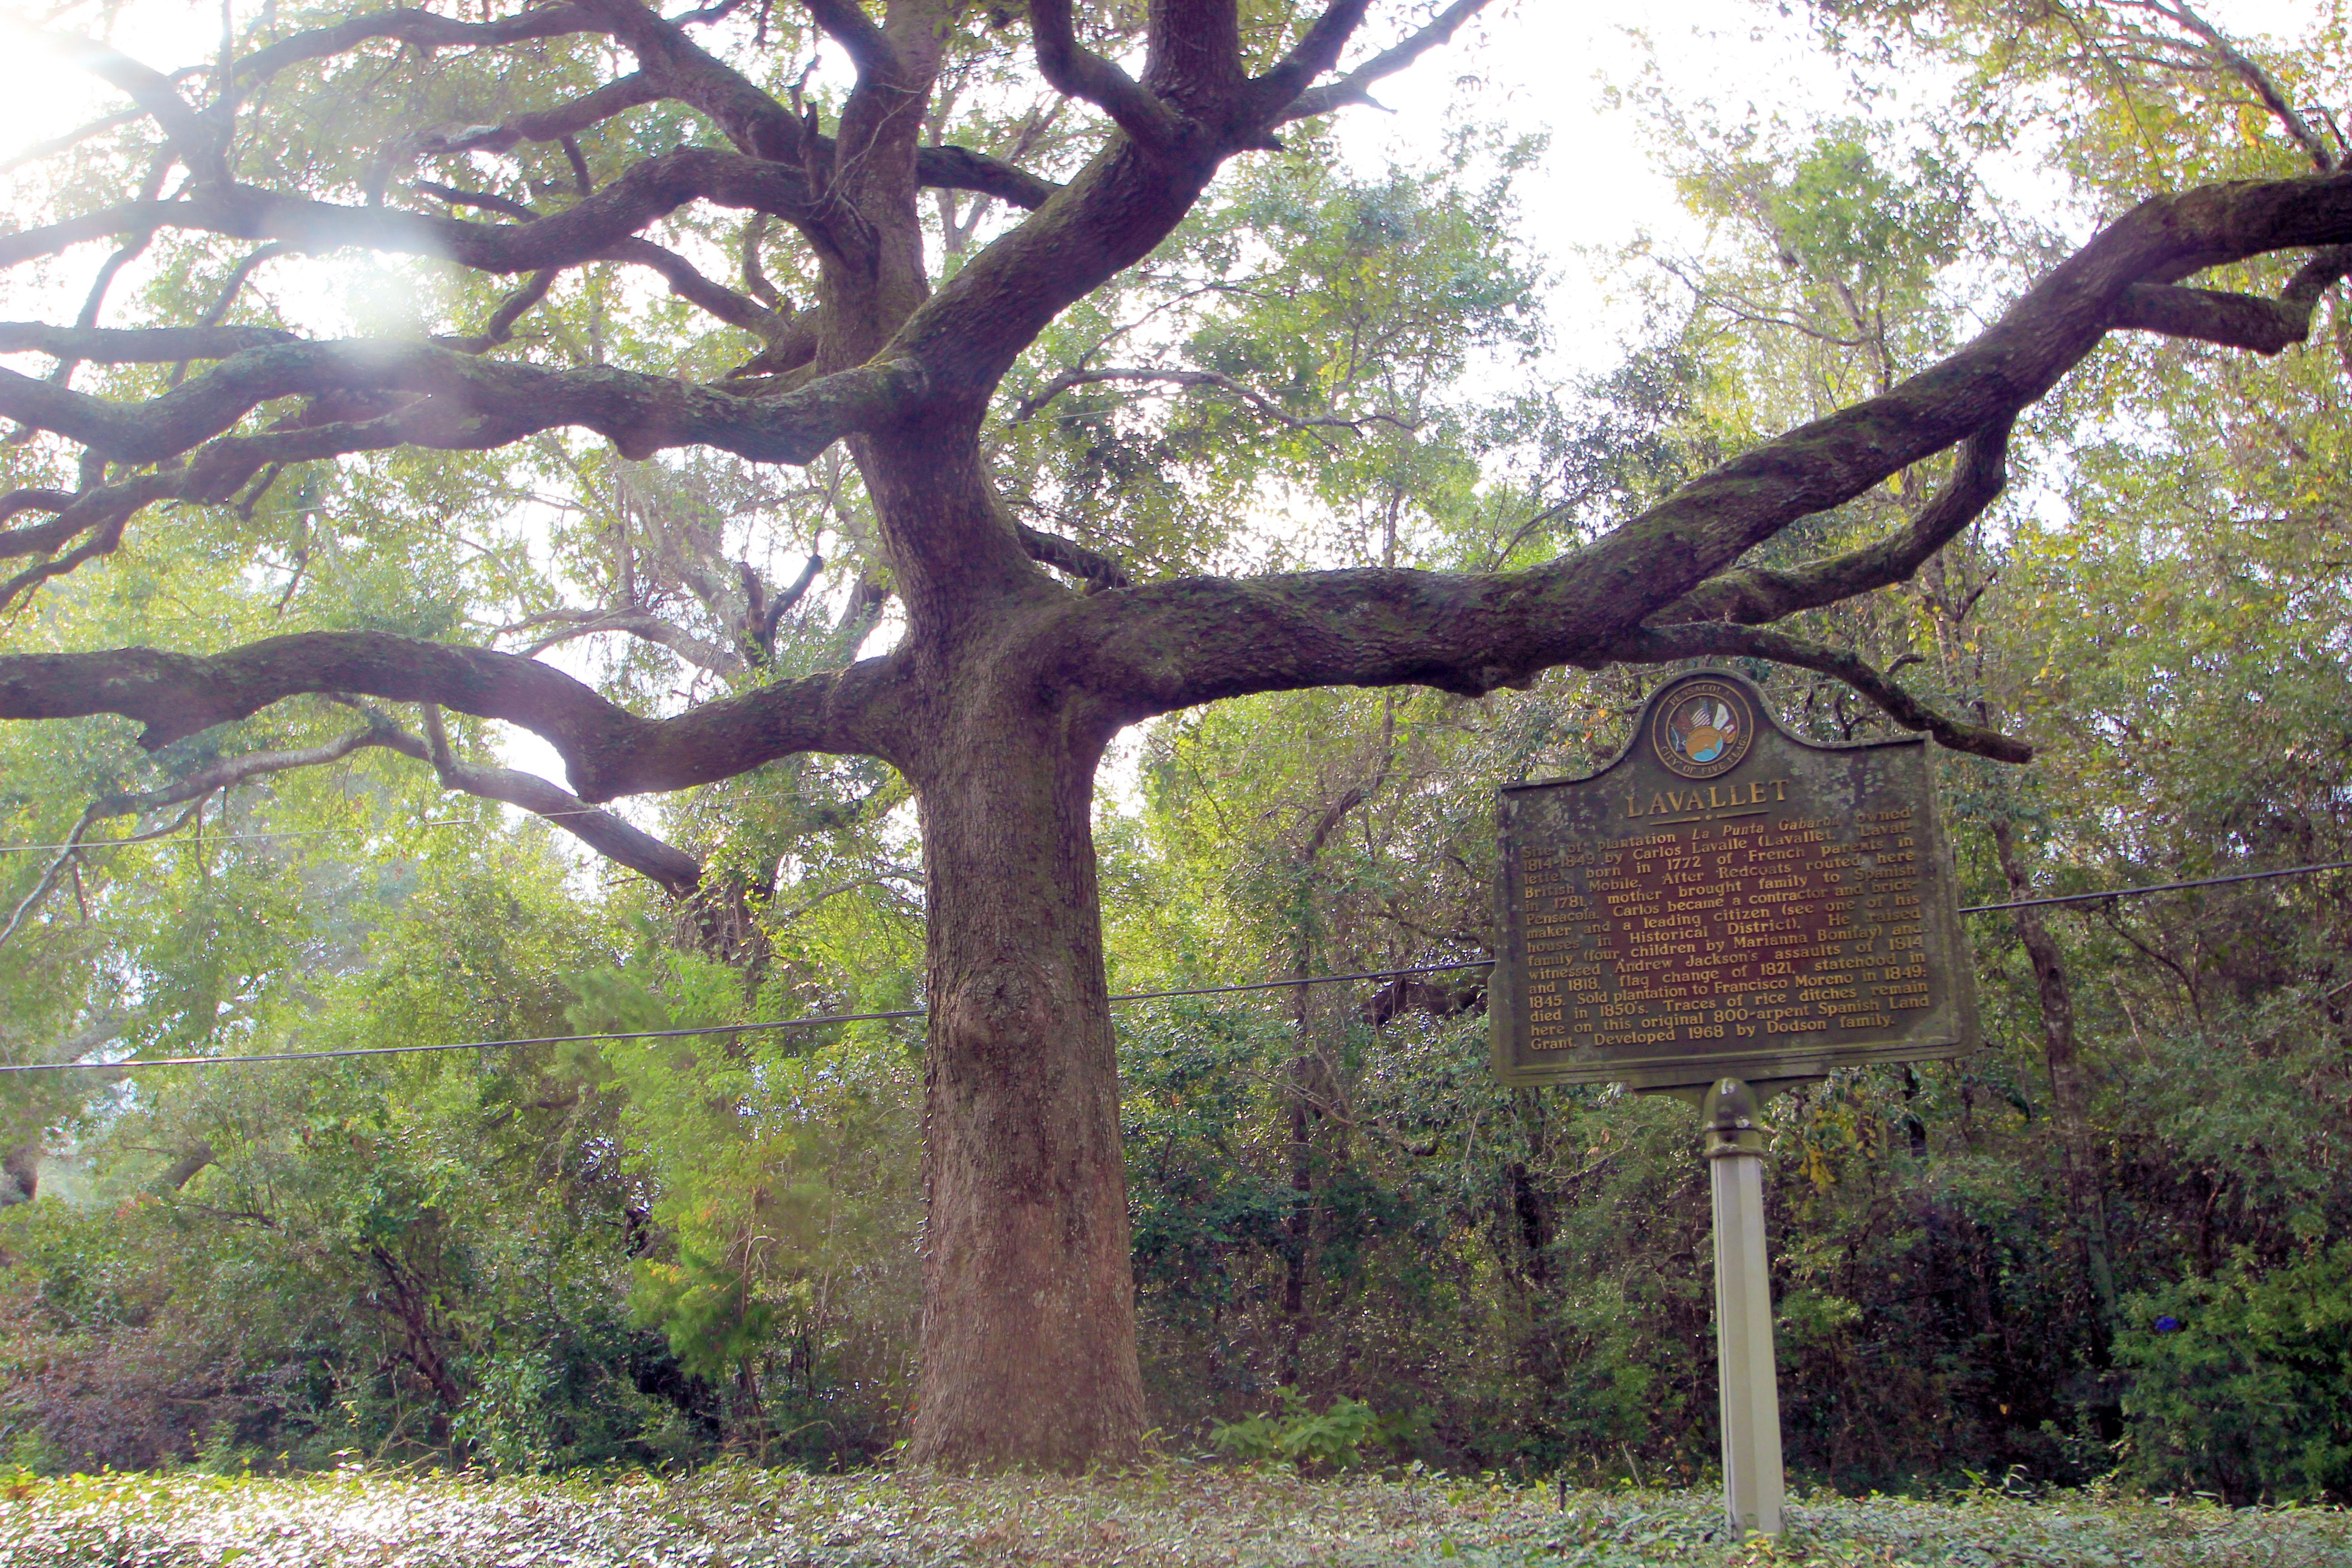 Lavallet history marker